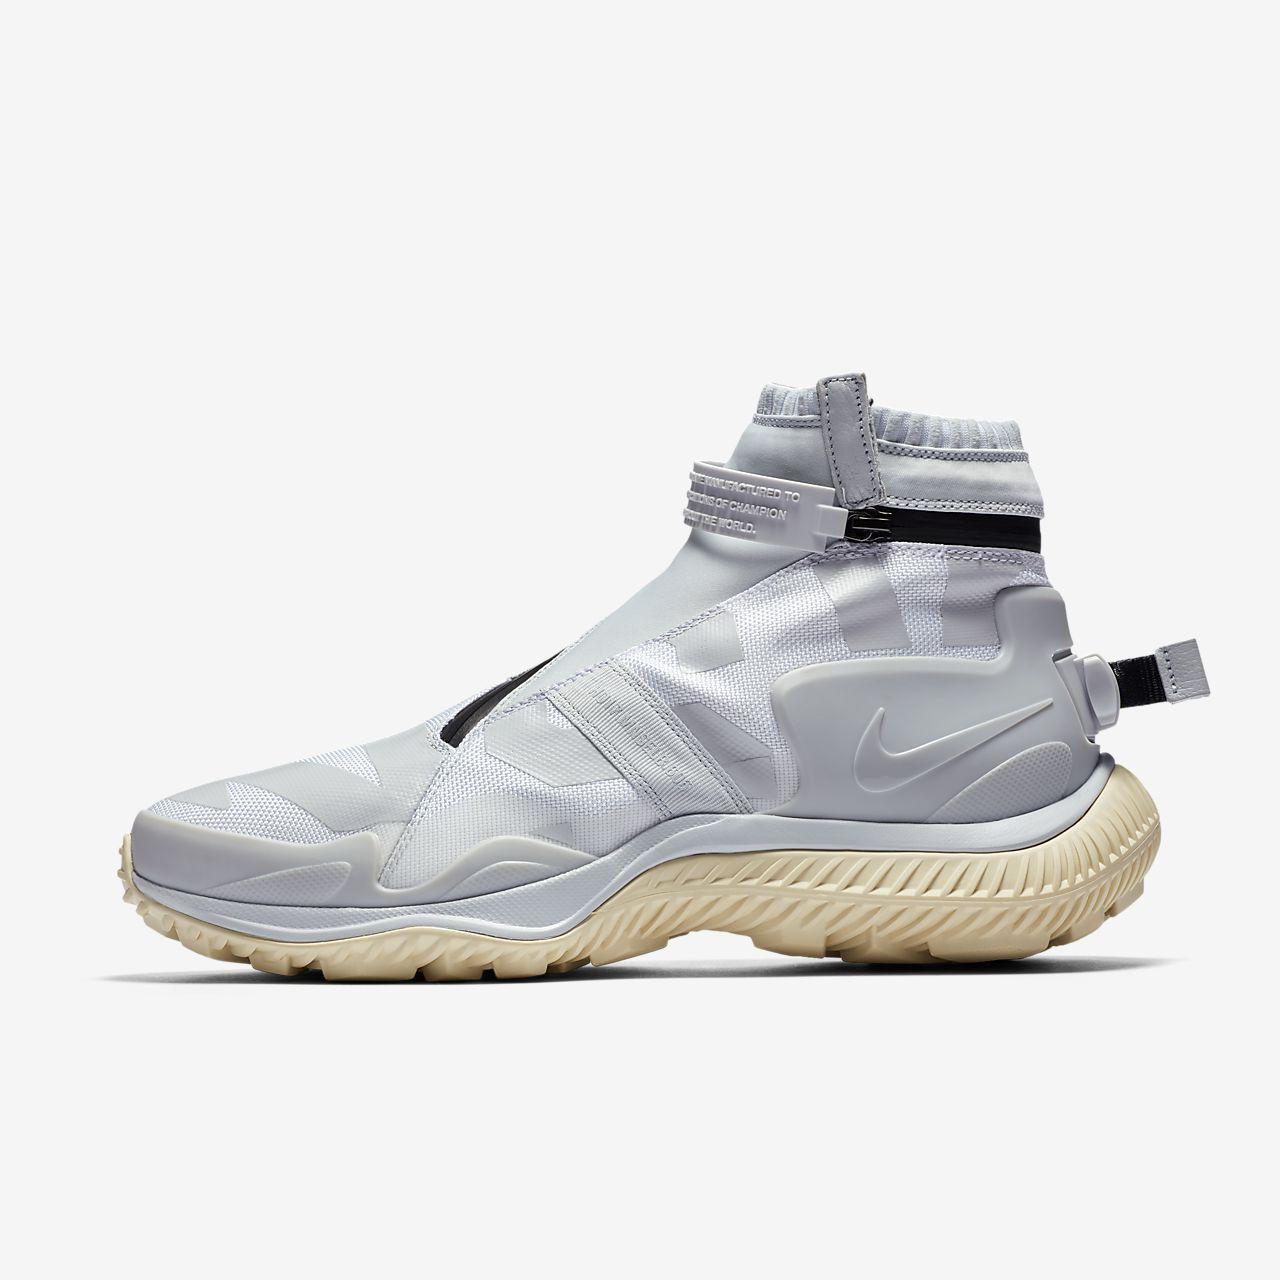 reputable site de108 34d63 Nike Gaiter Mens Boot